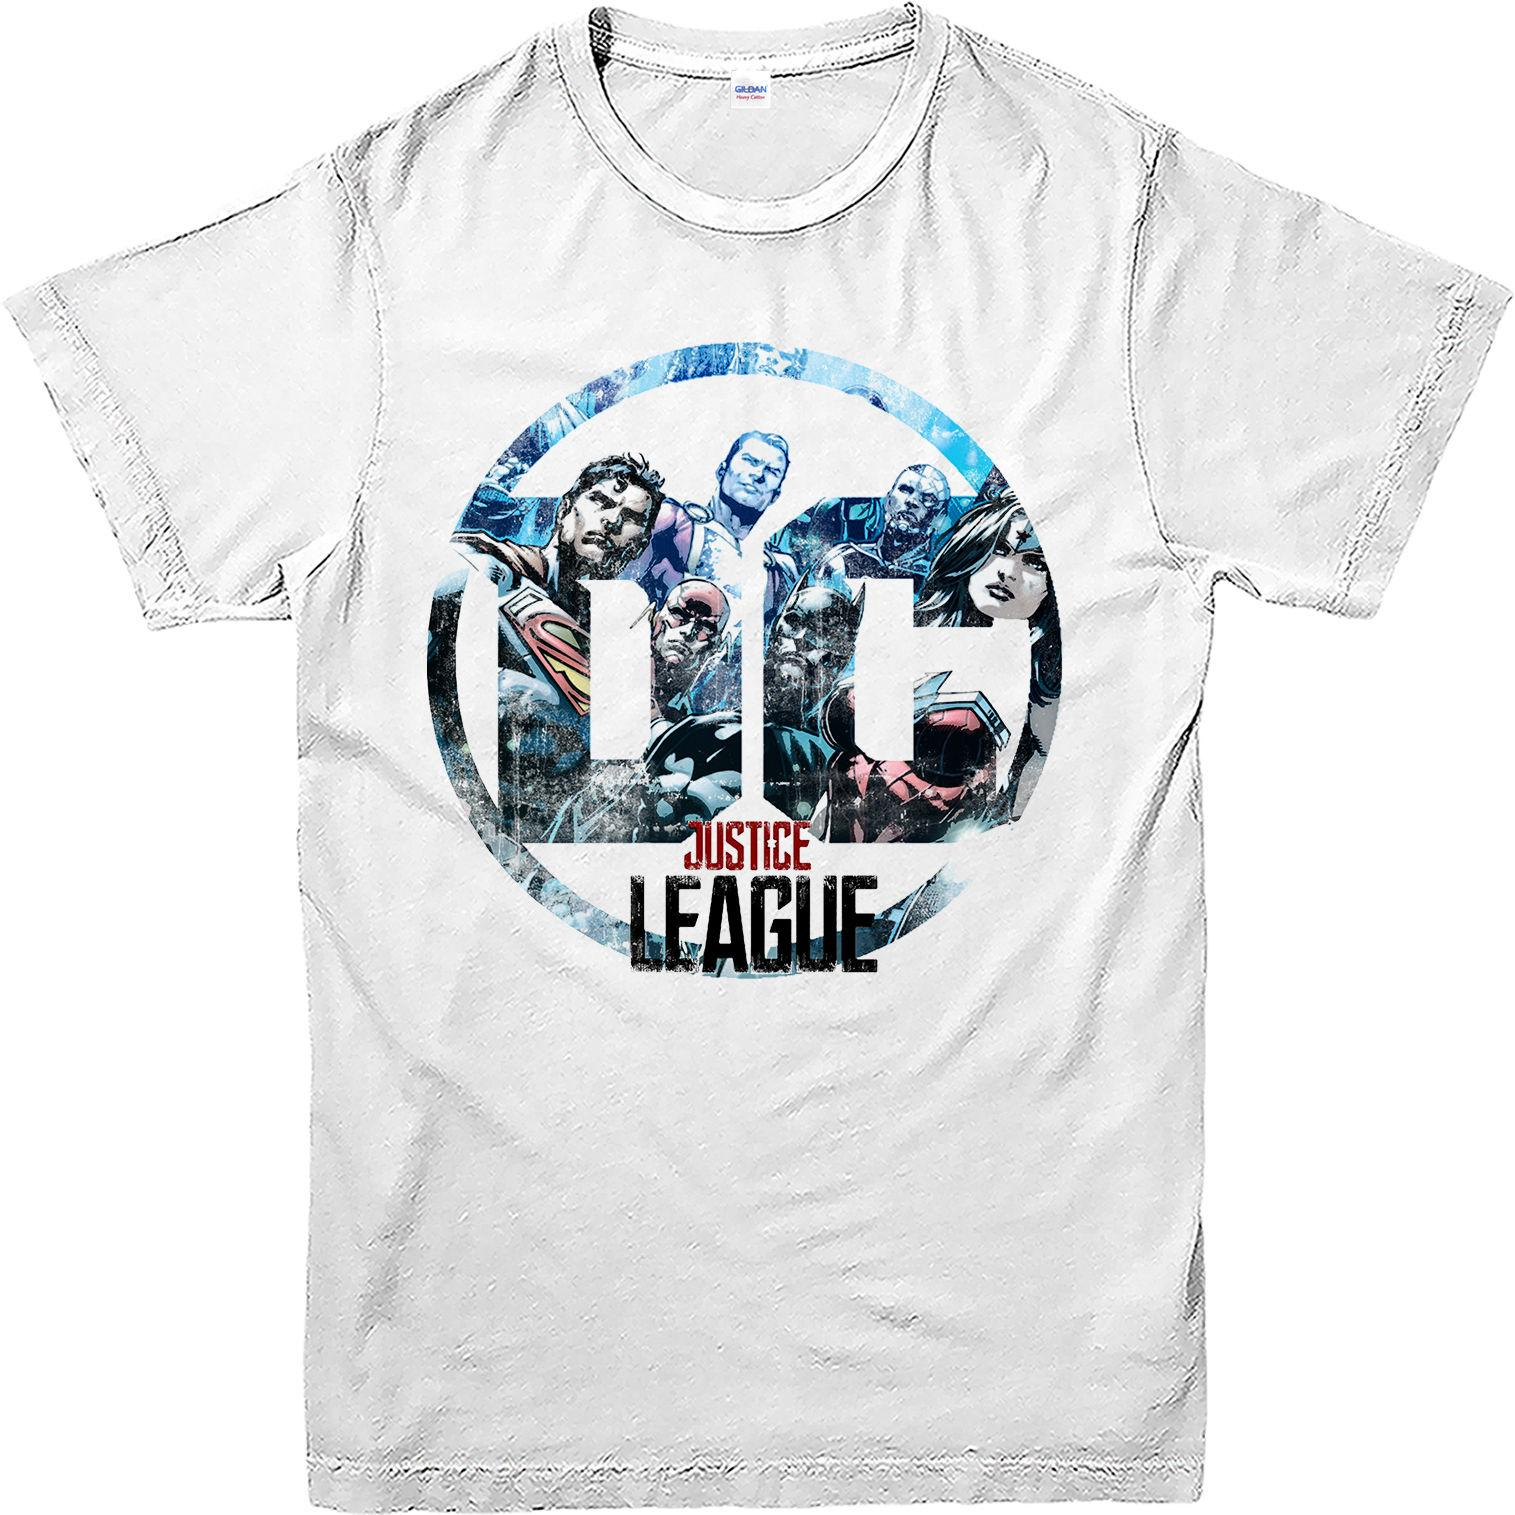 100 cotton brand new t shirts justice league t shirt dc for Dc t shirt design